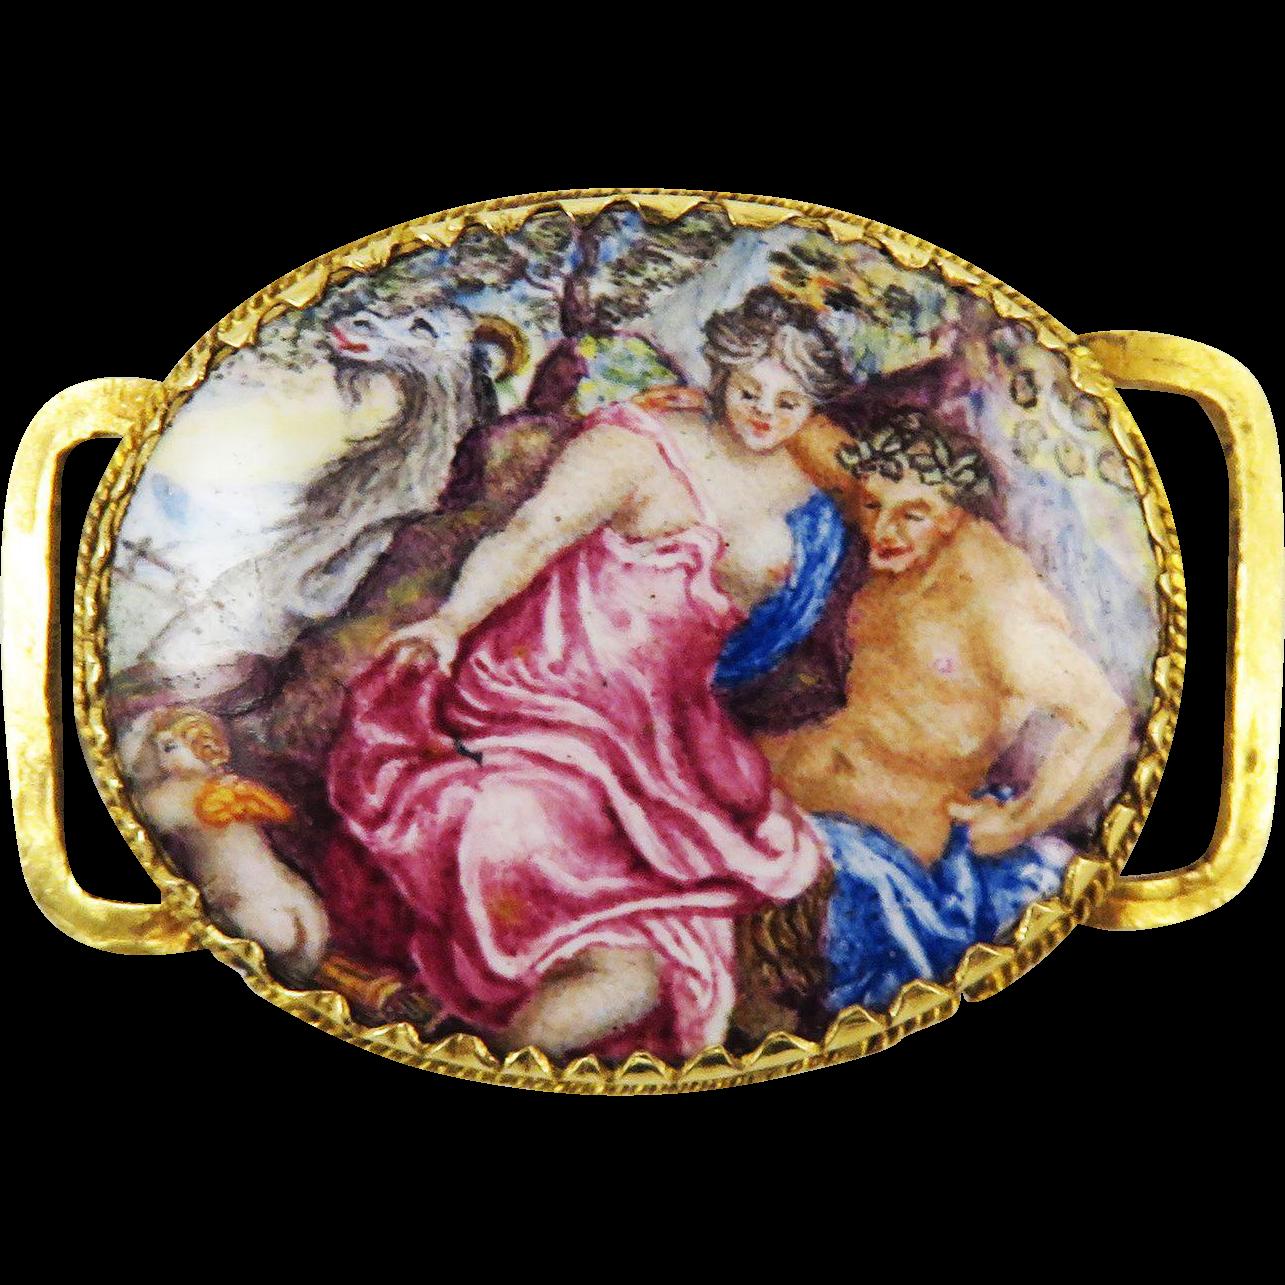 MAGNIFICENT Stuart Enamel/22k Slide, Artemis and Satyr w/Eros and Goat, c.1670!